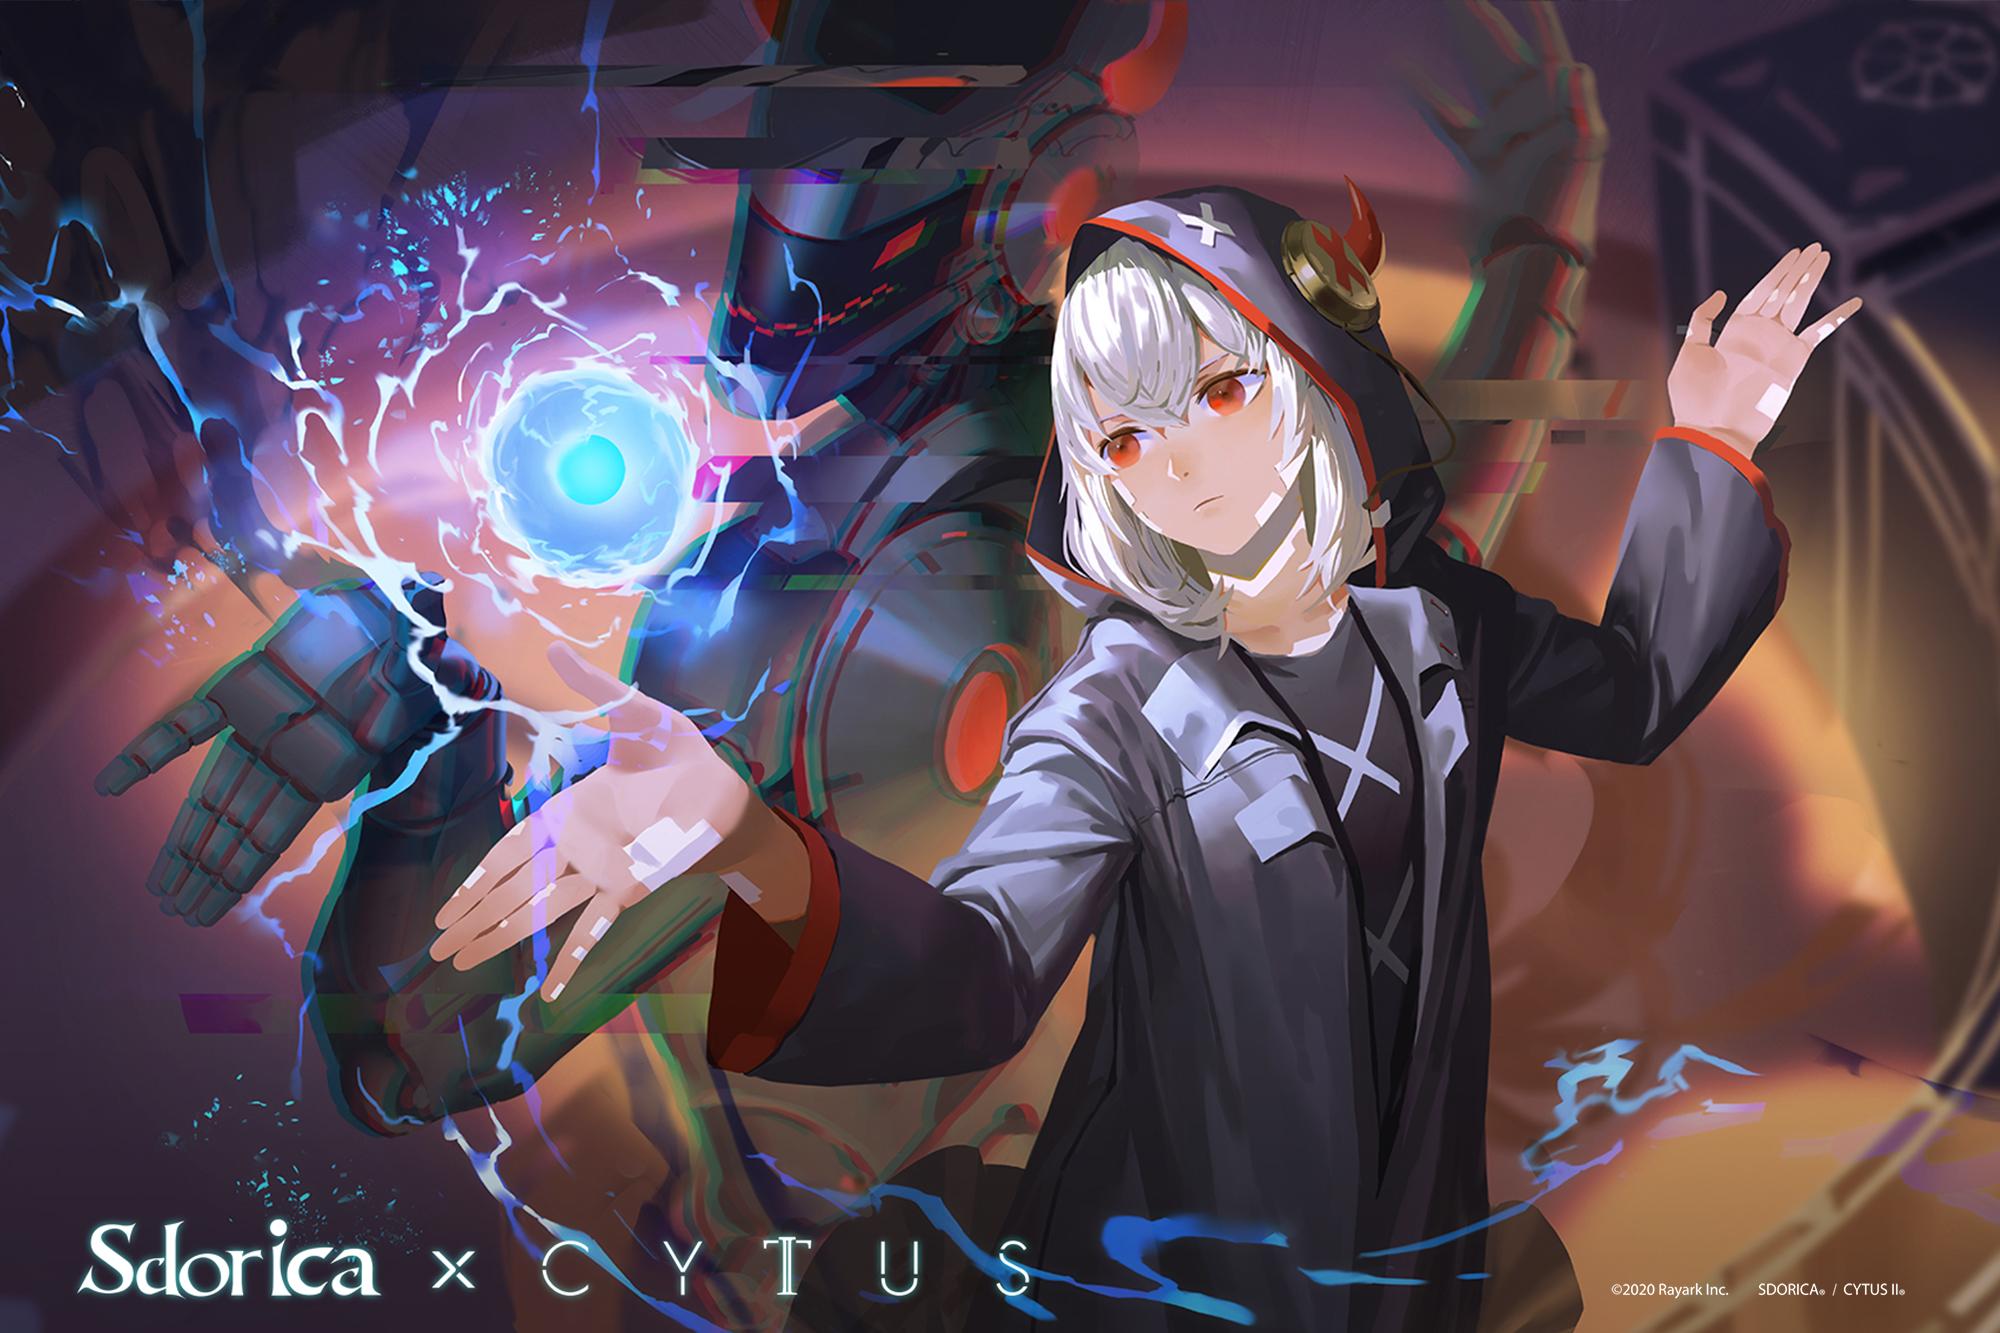 《Sdorica 萬象物語》與《Cytus II》合作開跑! 推出期間限定角色與劇情關卡 - Yahoo奇摩遊戲電競